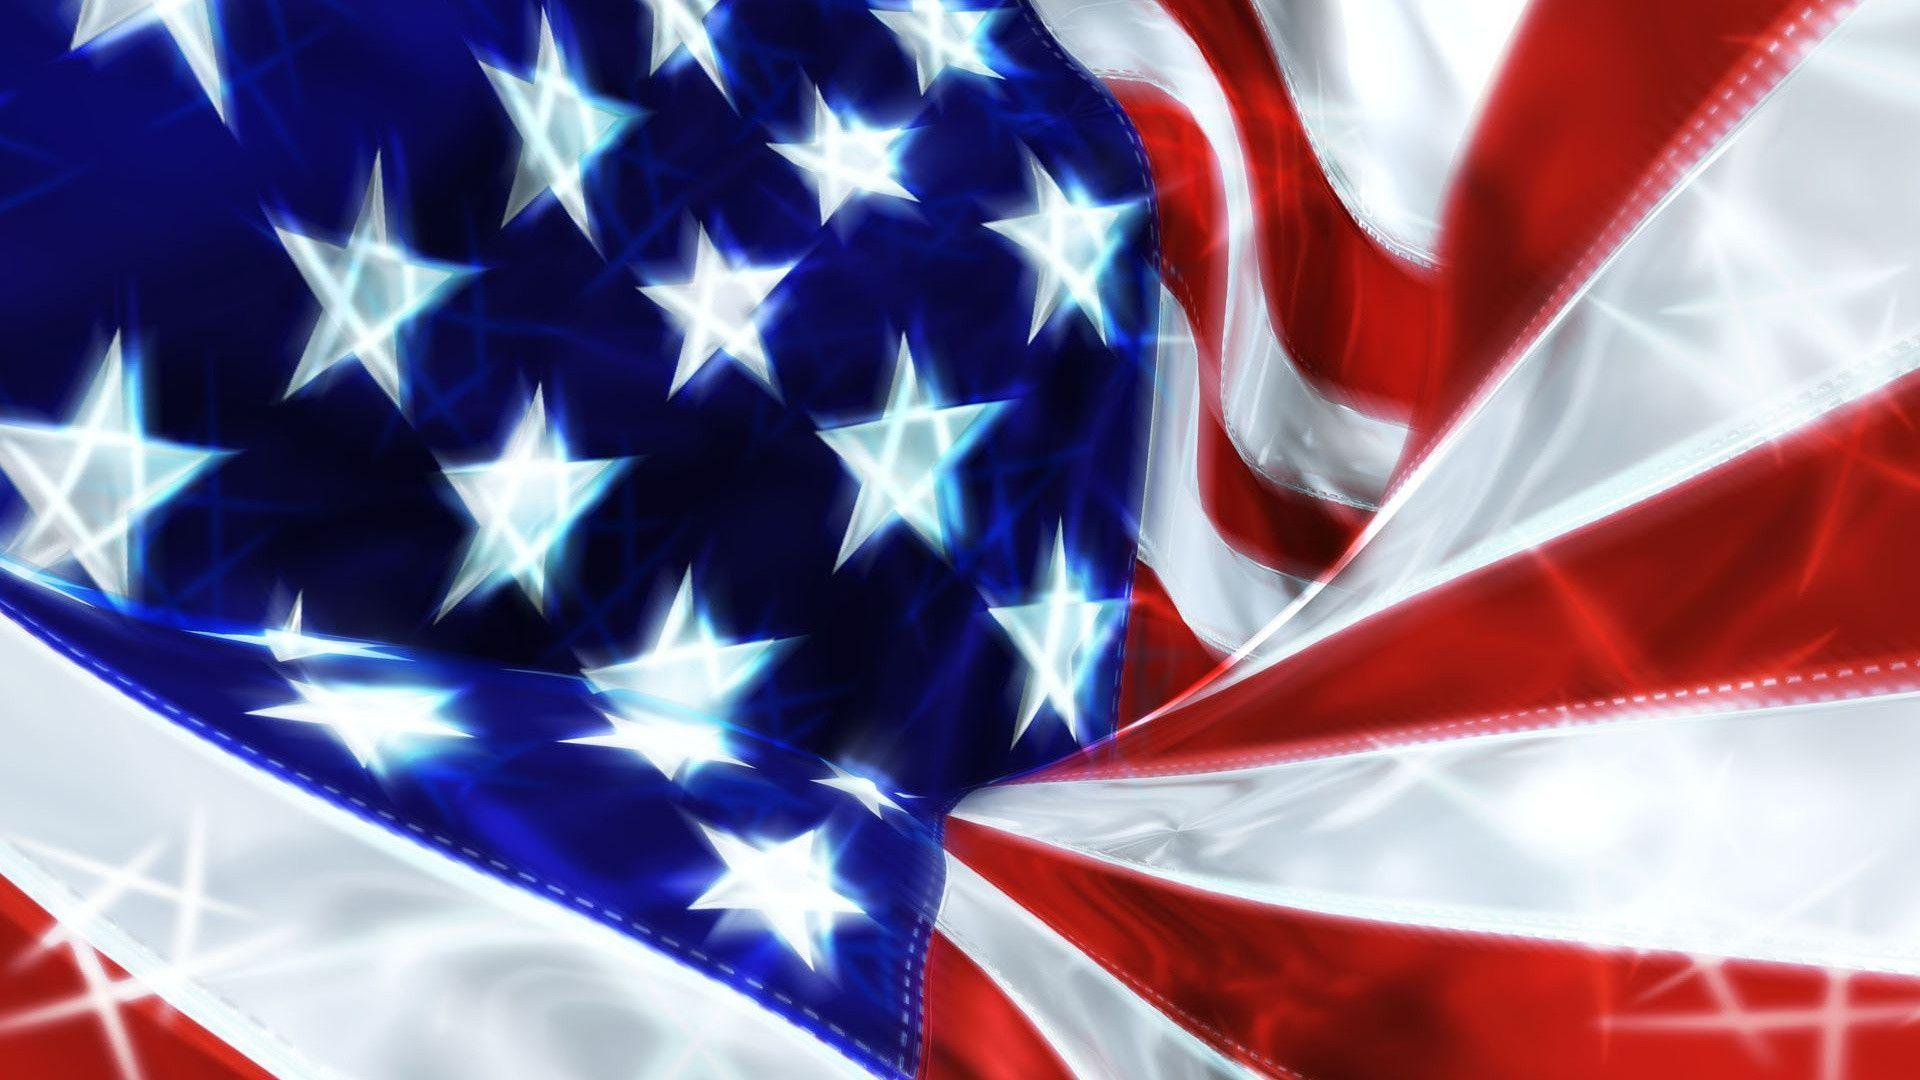 Usa Flag Wallpaper 1920x1080 - www.